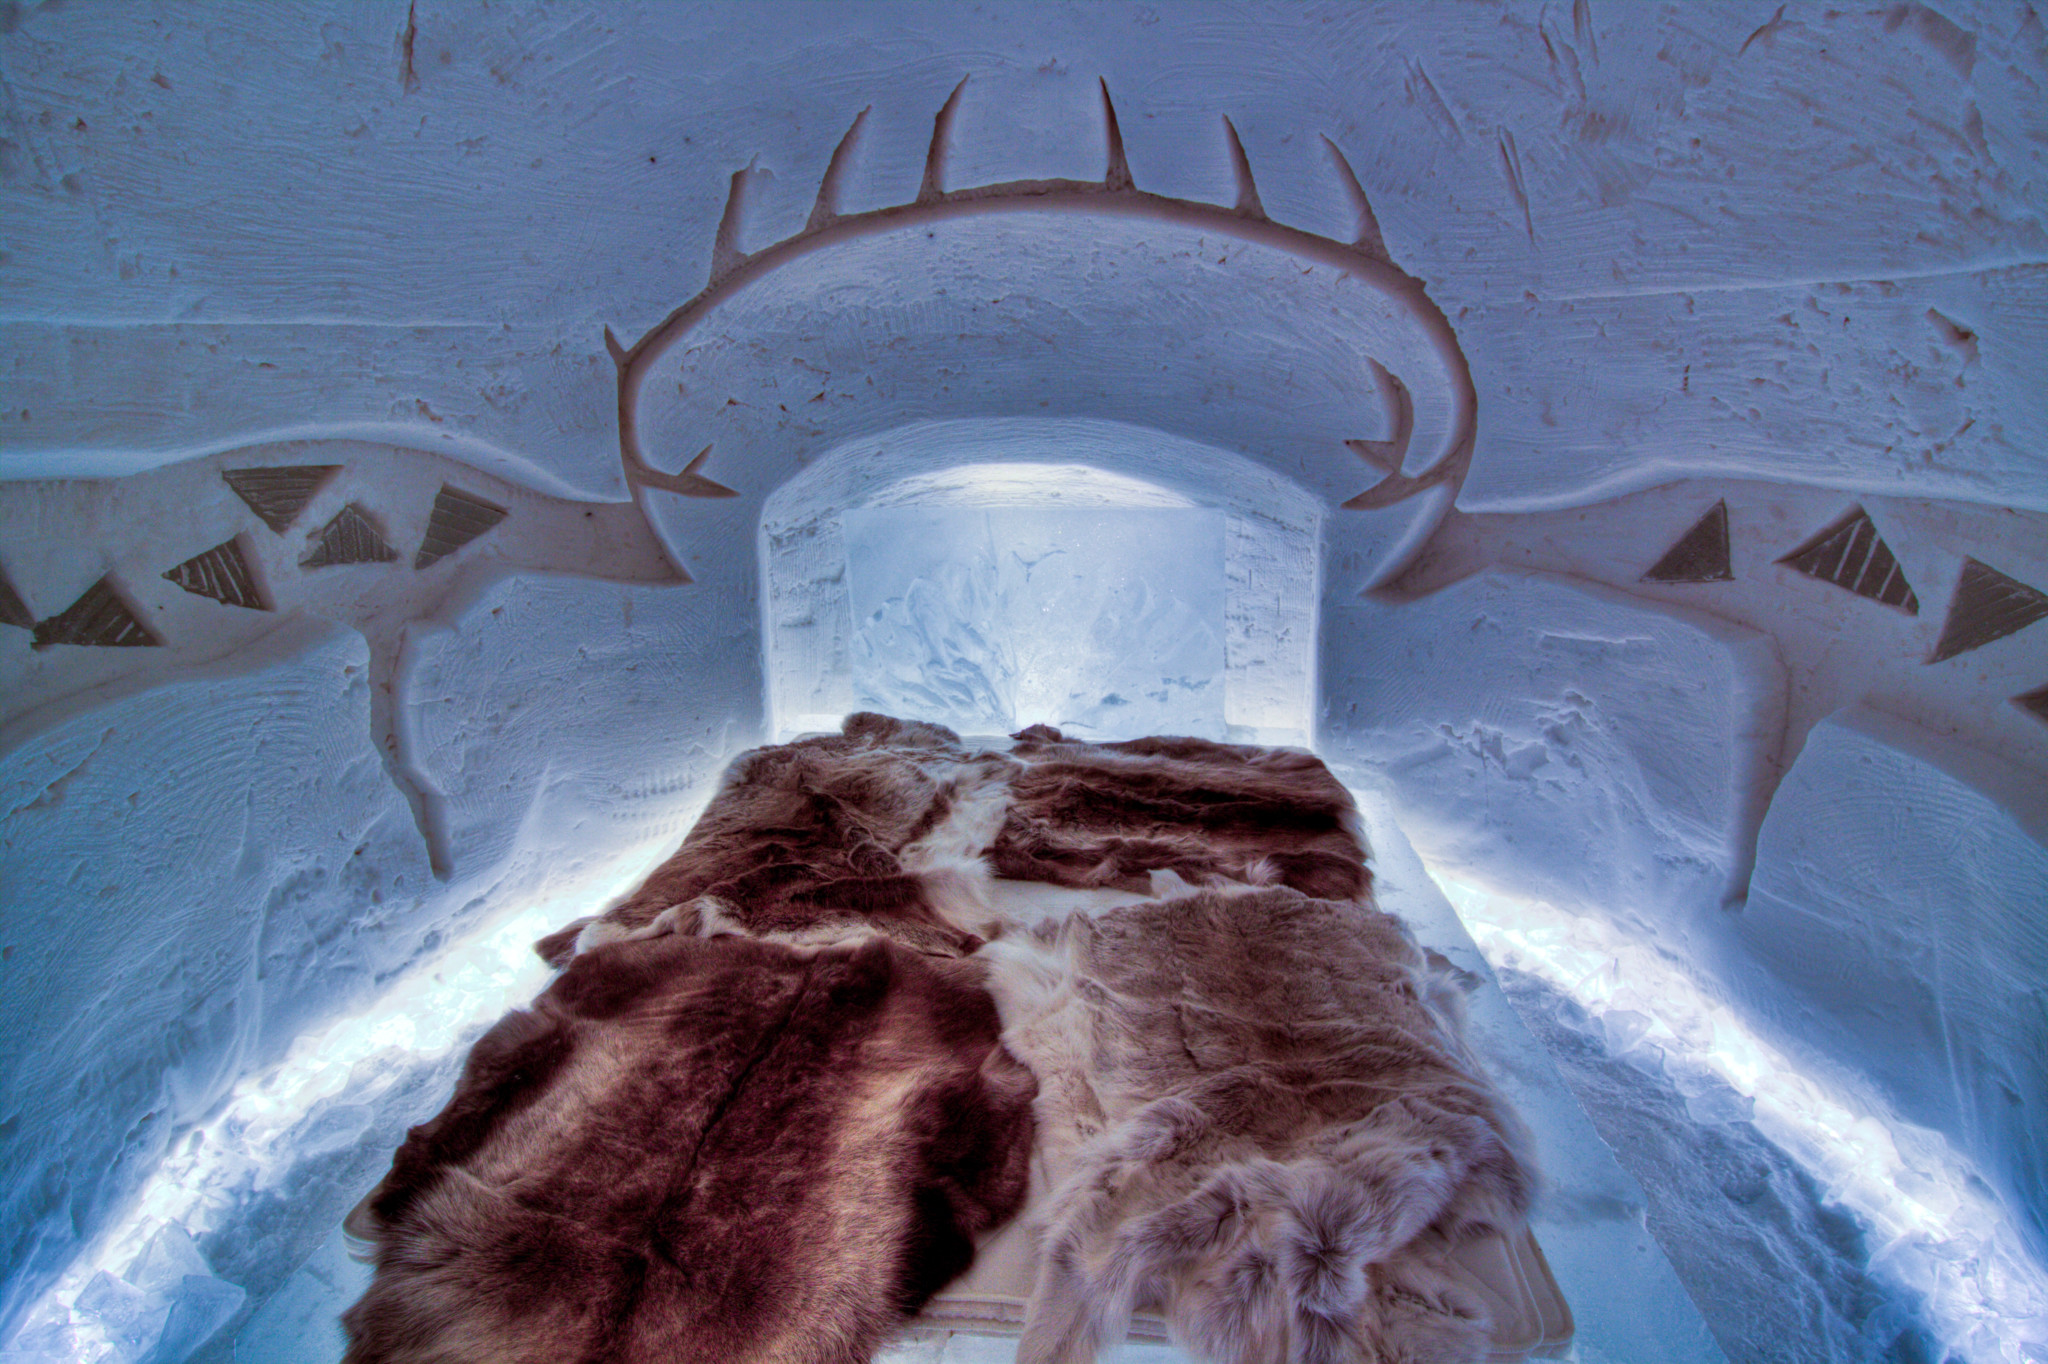 Arctic Snow Hotel in Rovaniemi Lapland Finland